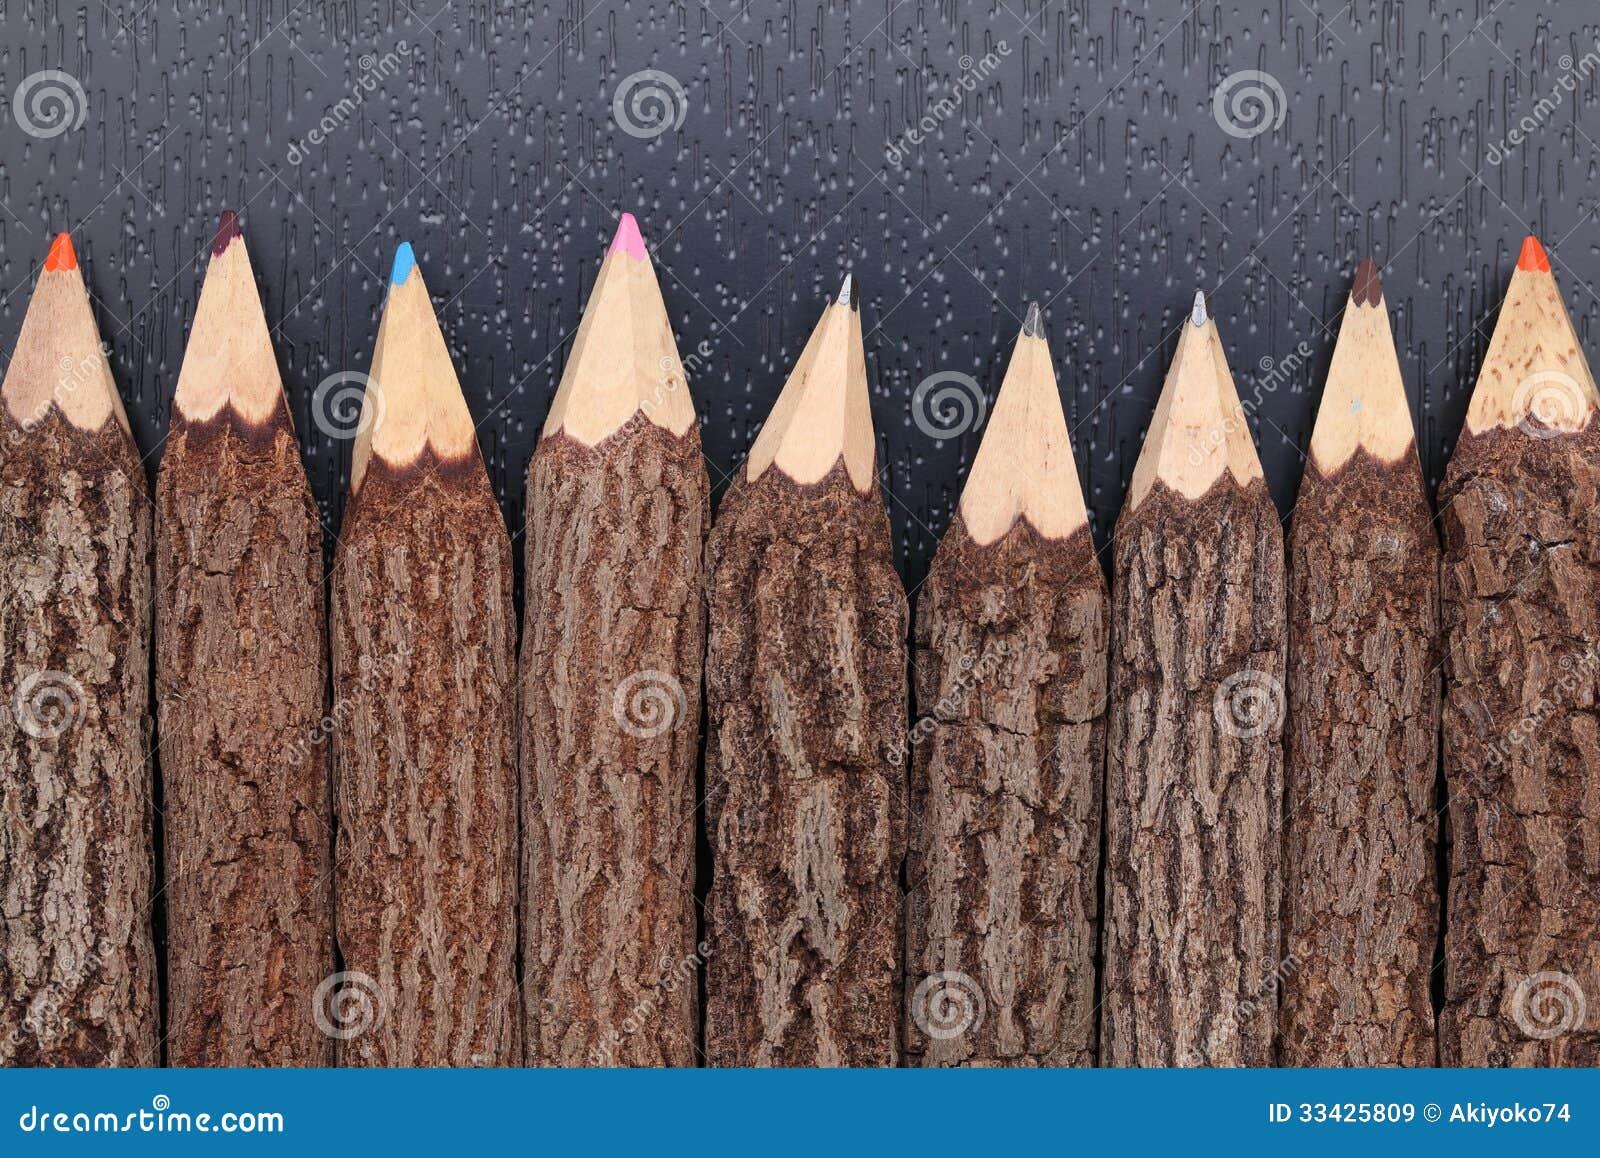 crayons de tronc d 39 arbre image stock image du objet 33425809. Black Bedroom Furniture Sets. Home Design Ideas